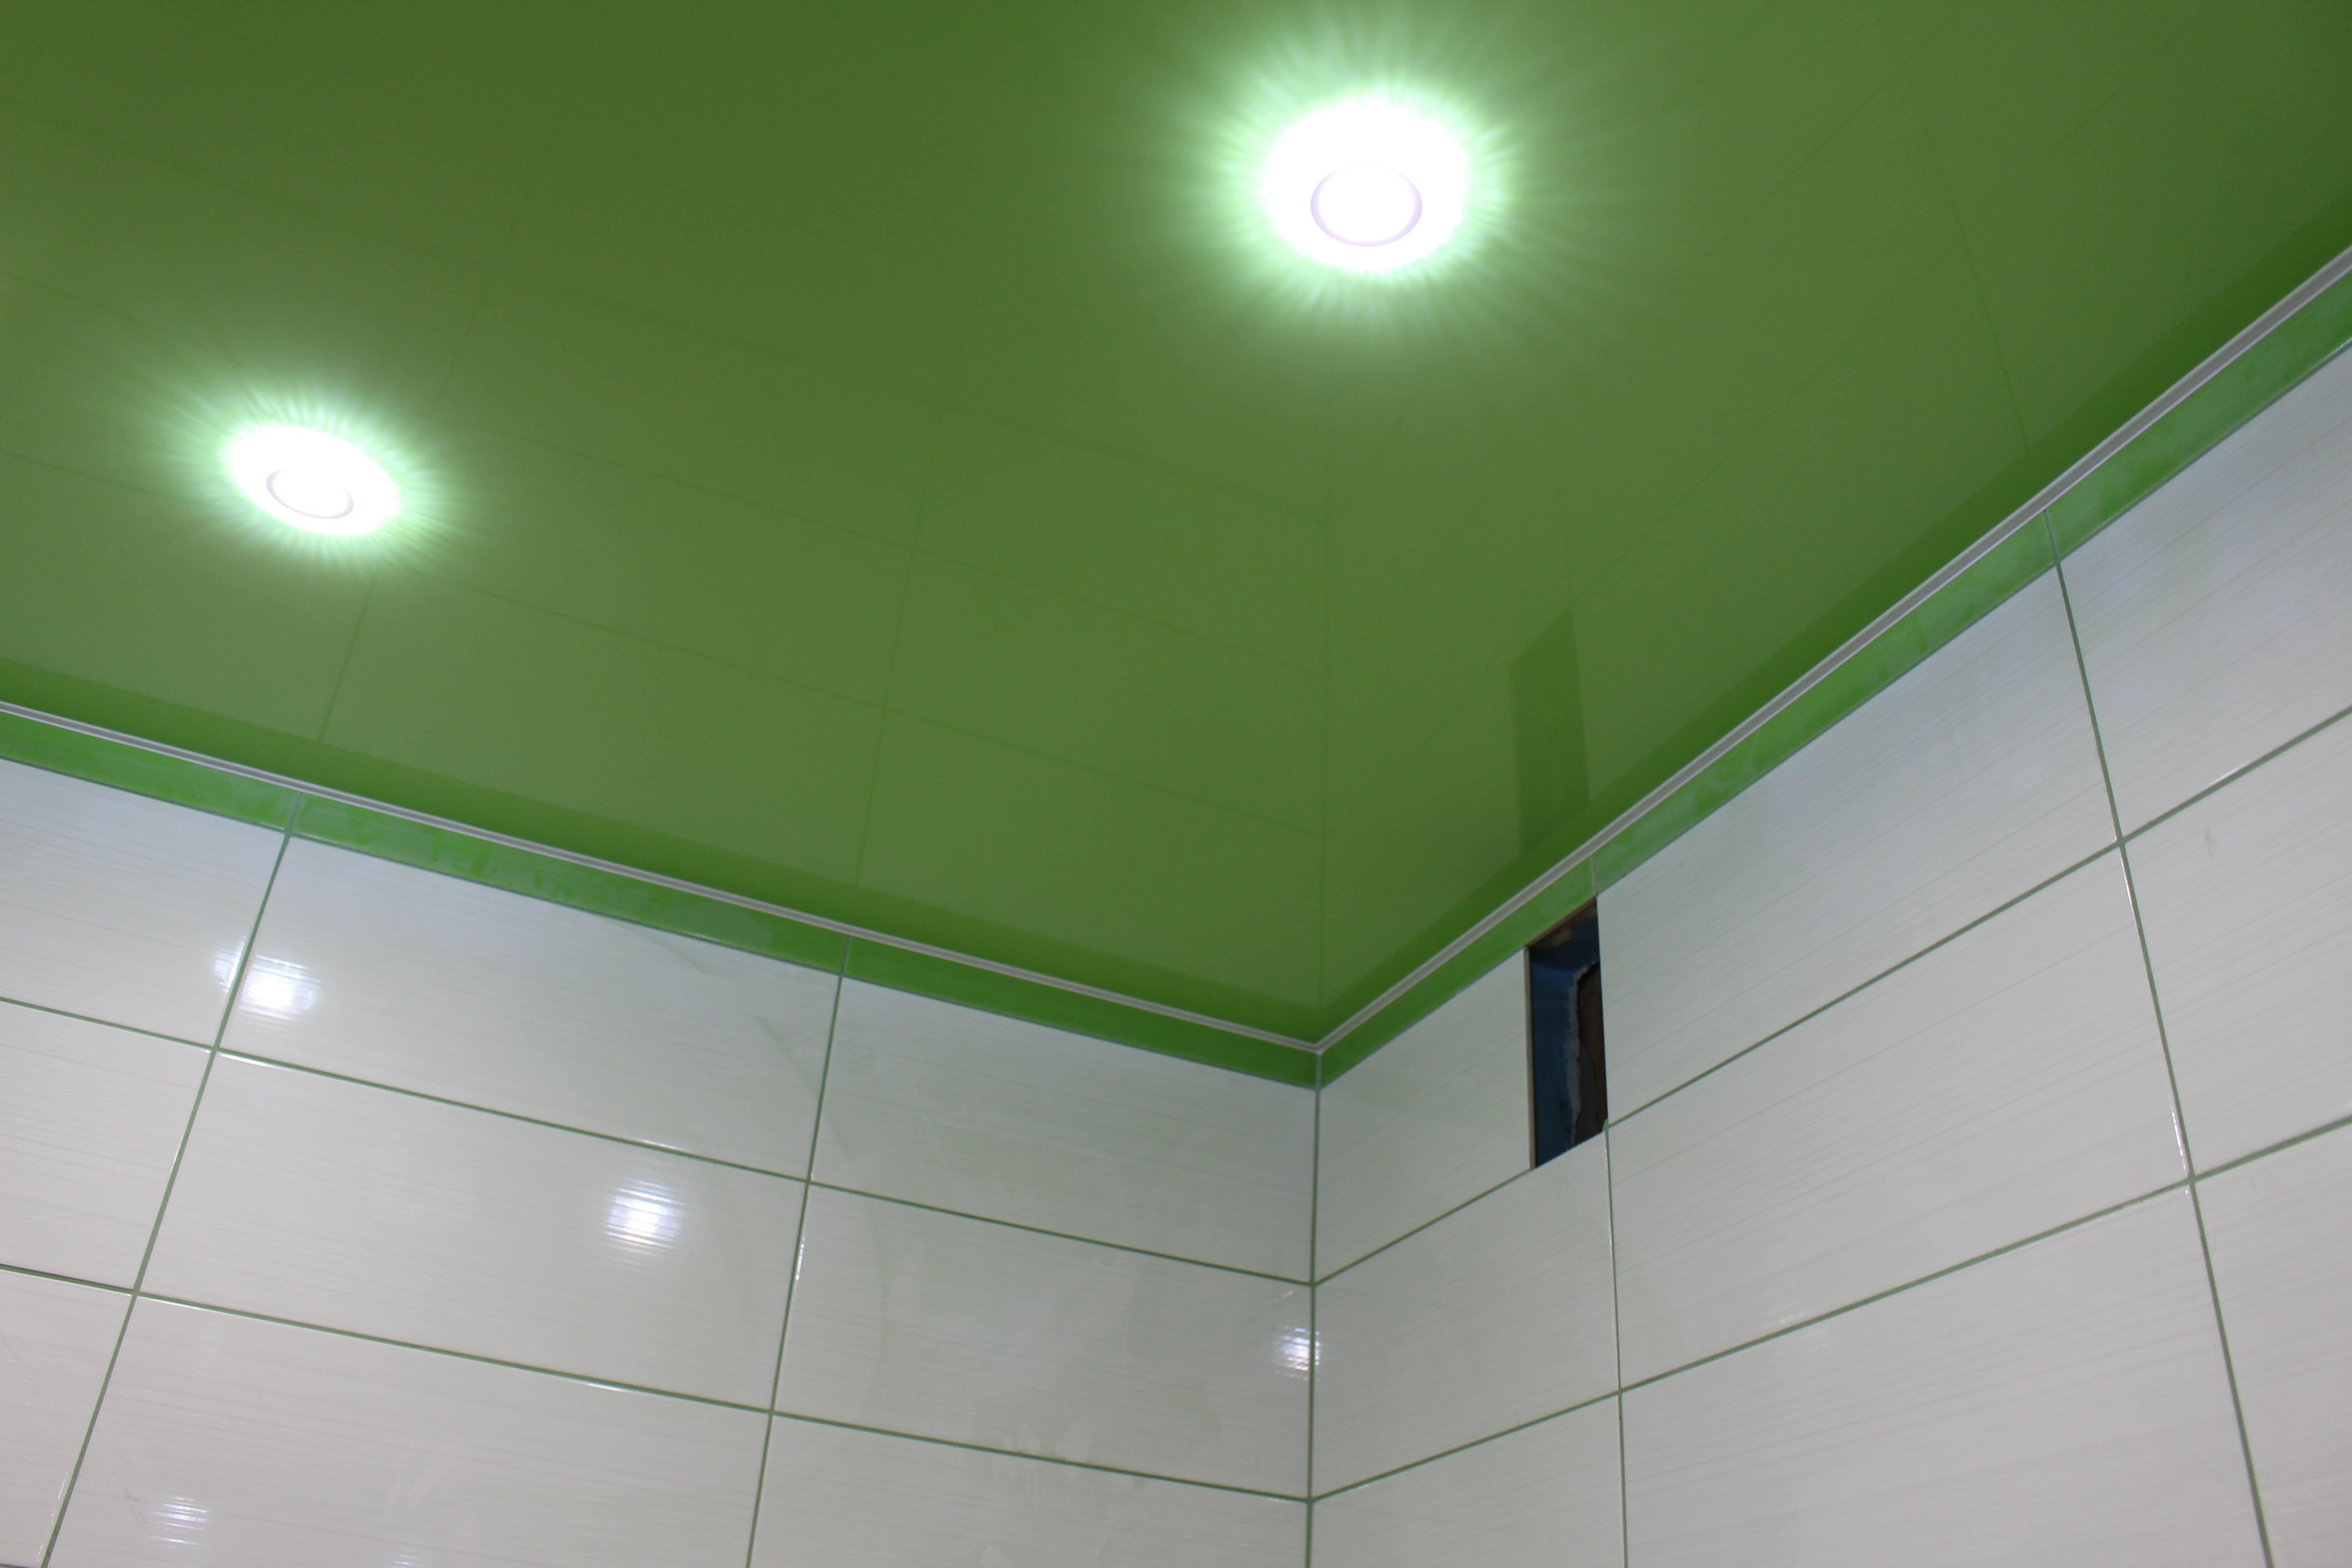 Sufity napinane do łazienki